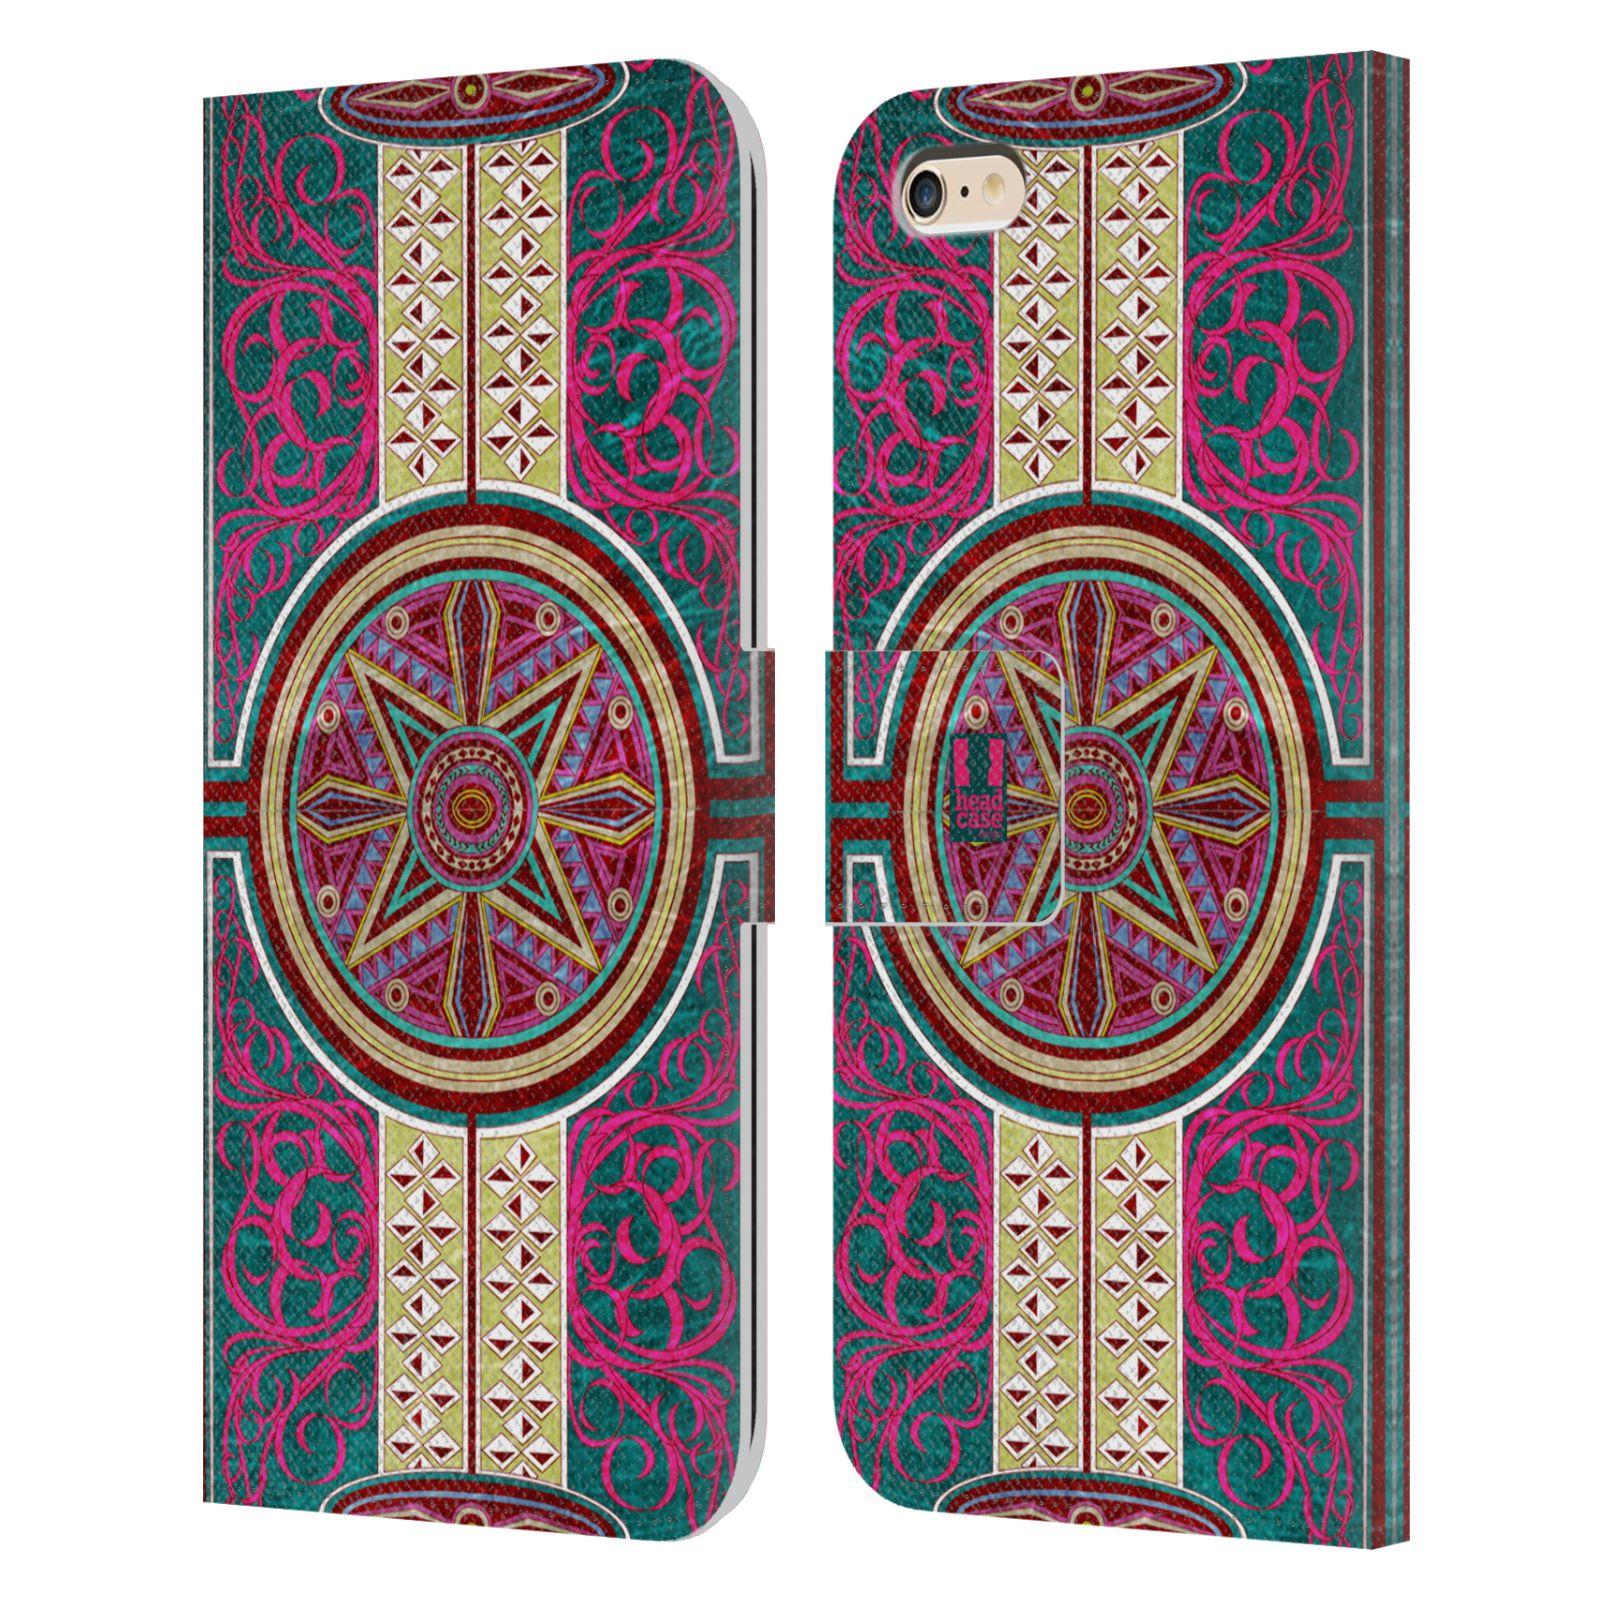 HEAD CASE Flipové pouzdro pro mobil Apple Iphone 6 PLUS / 6S PLUS ARABESKA Baroko rudá kruh